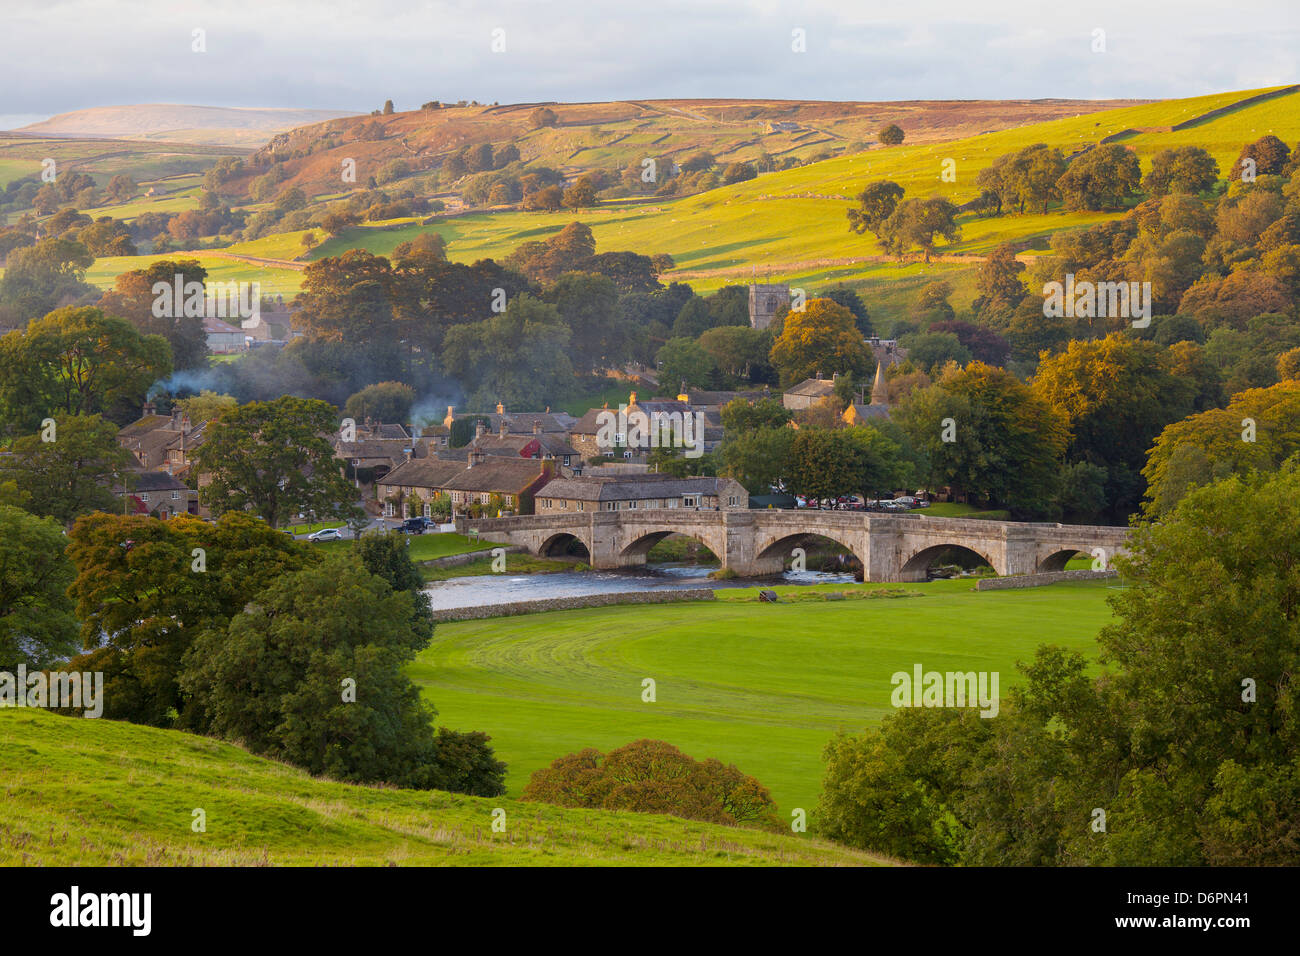 Burnsall, Yorkshire Dales National Park, Yorkshire, England, United Kingdom, Europe - Stock Image